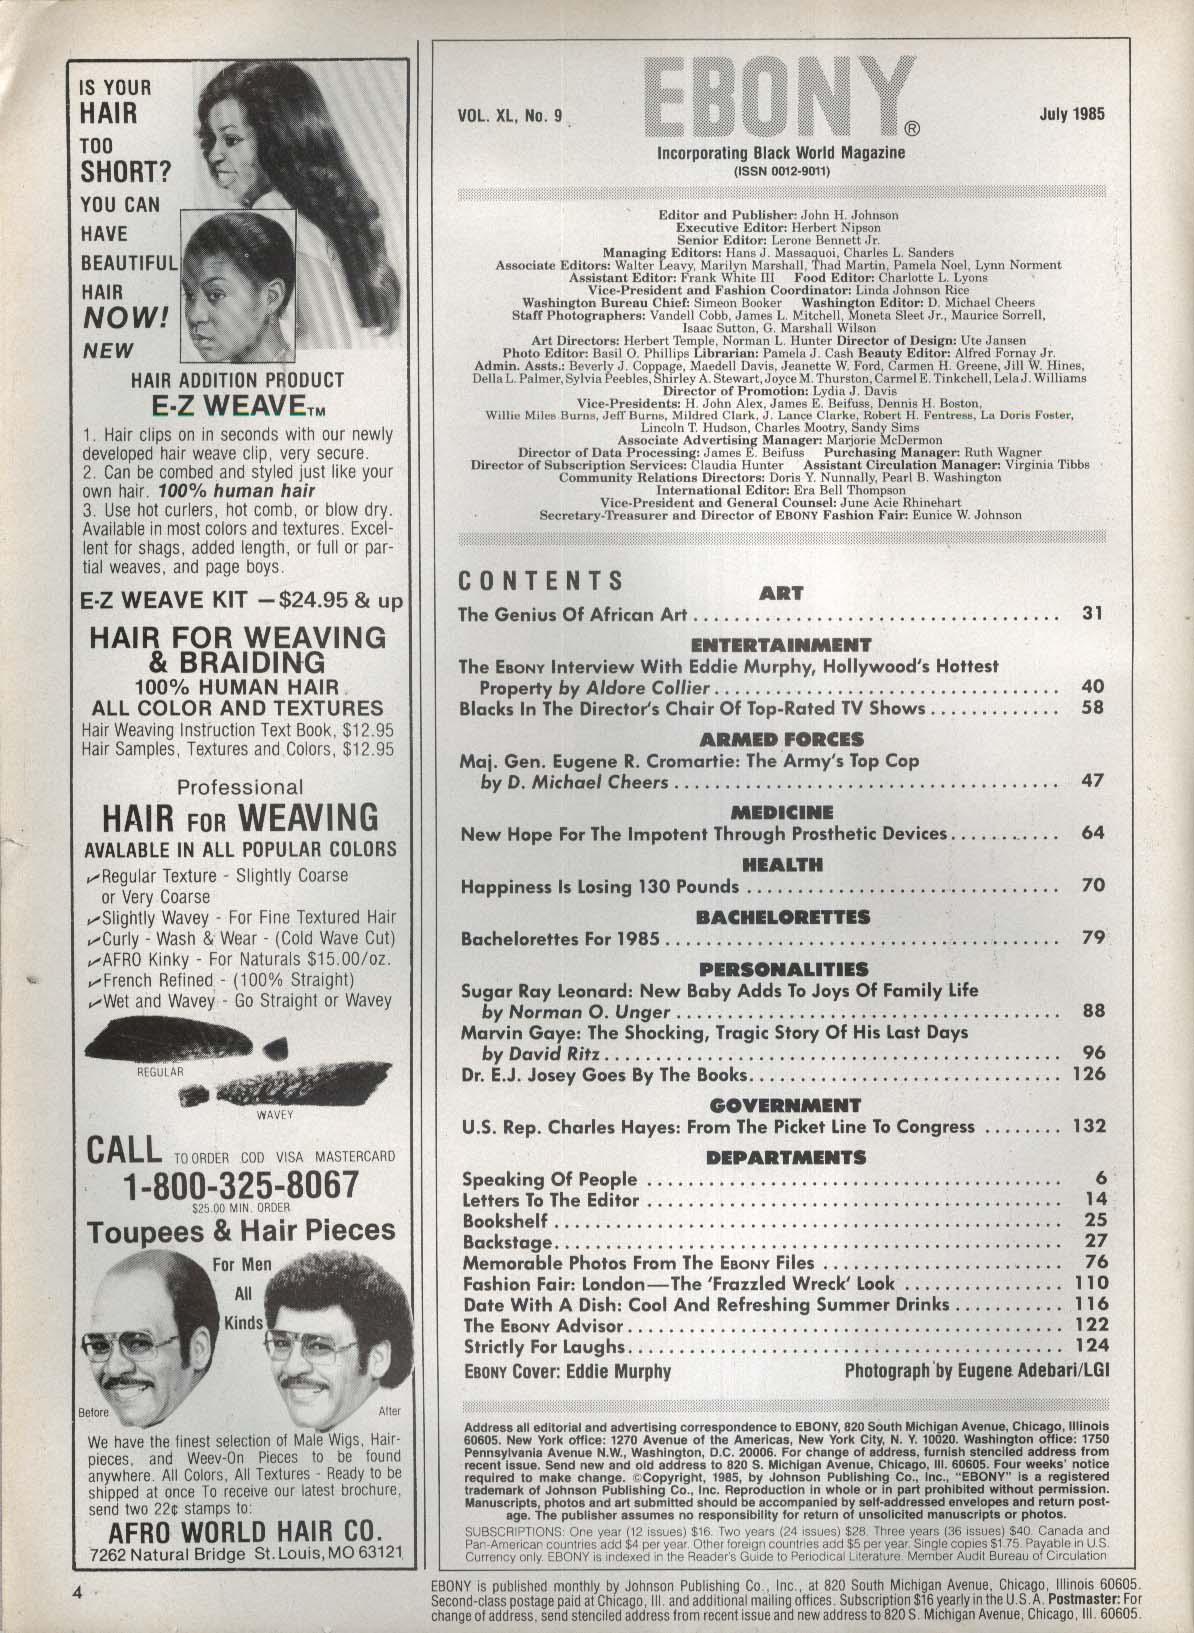 EBONY Eddie Murphy Marvin Gaye Sugar Ray Leonard 6 1985